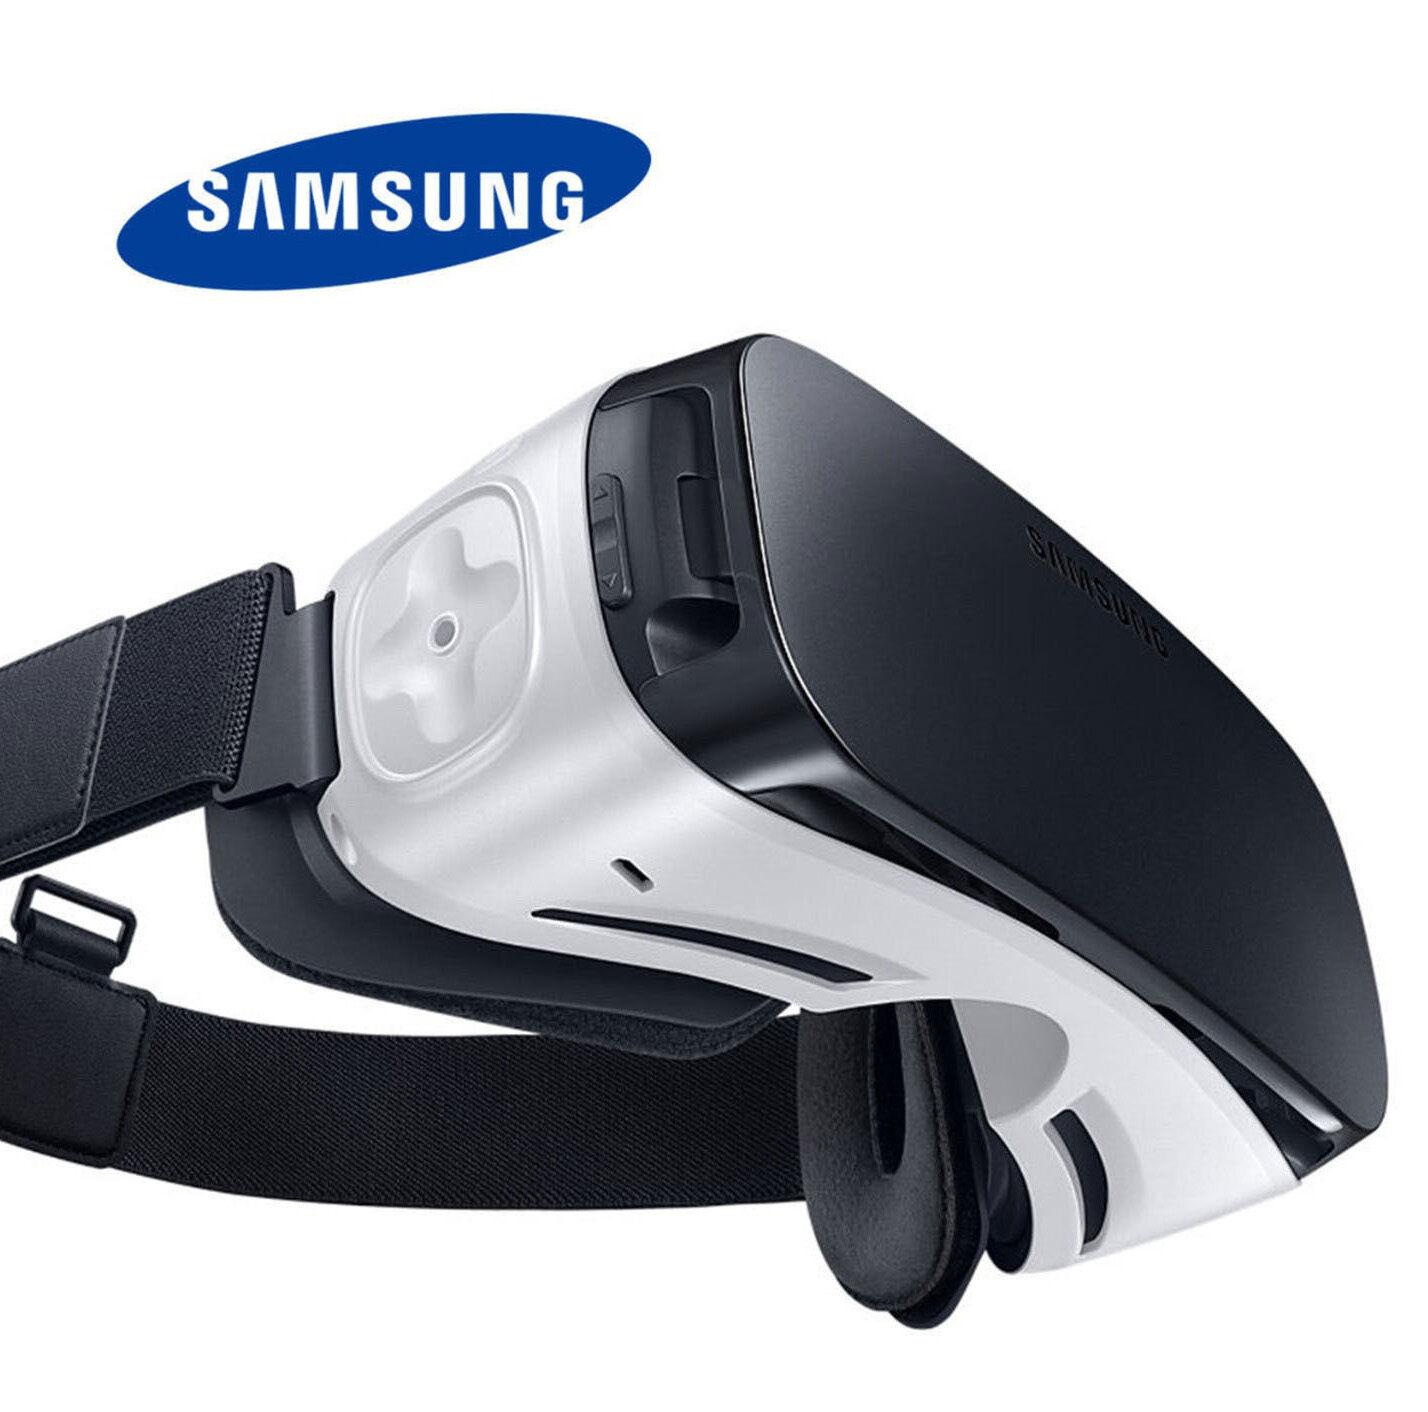 SAMSUNG GEAR VR OCULUS SM-R322 CONSUMER EDITION For GALAXY NOTE 5 S6 PLUS EDGE | eBay